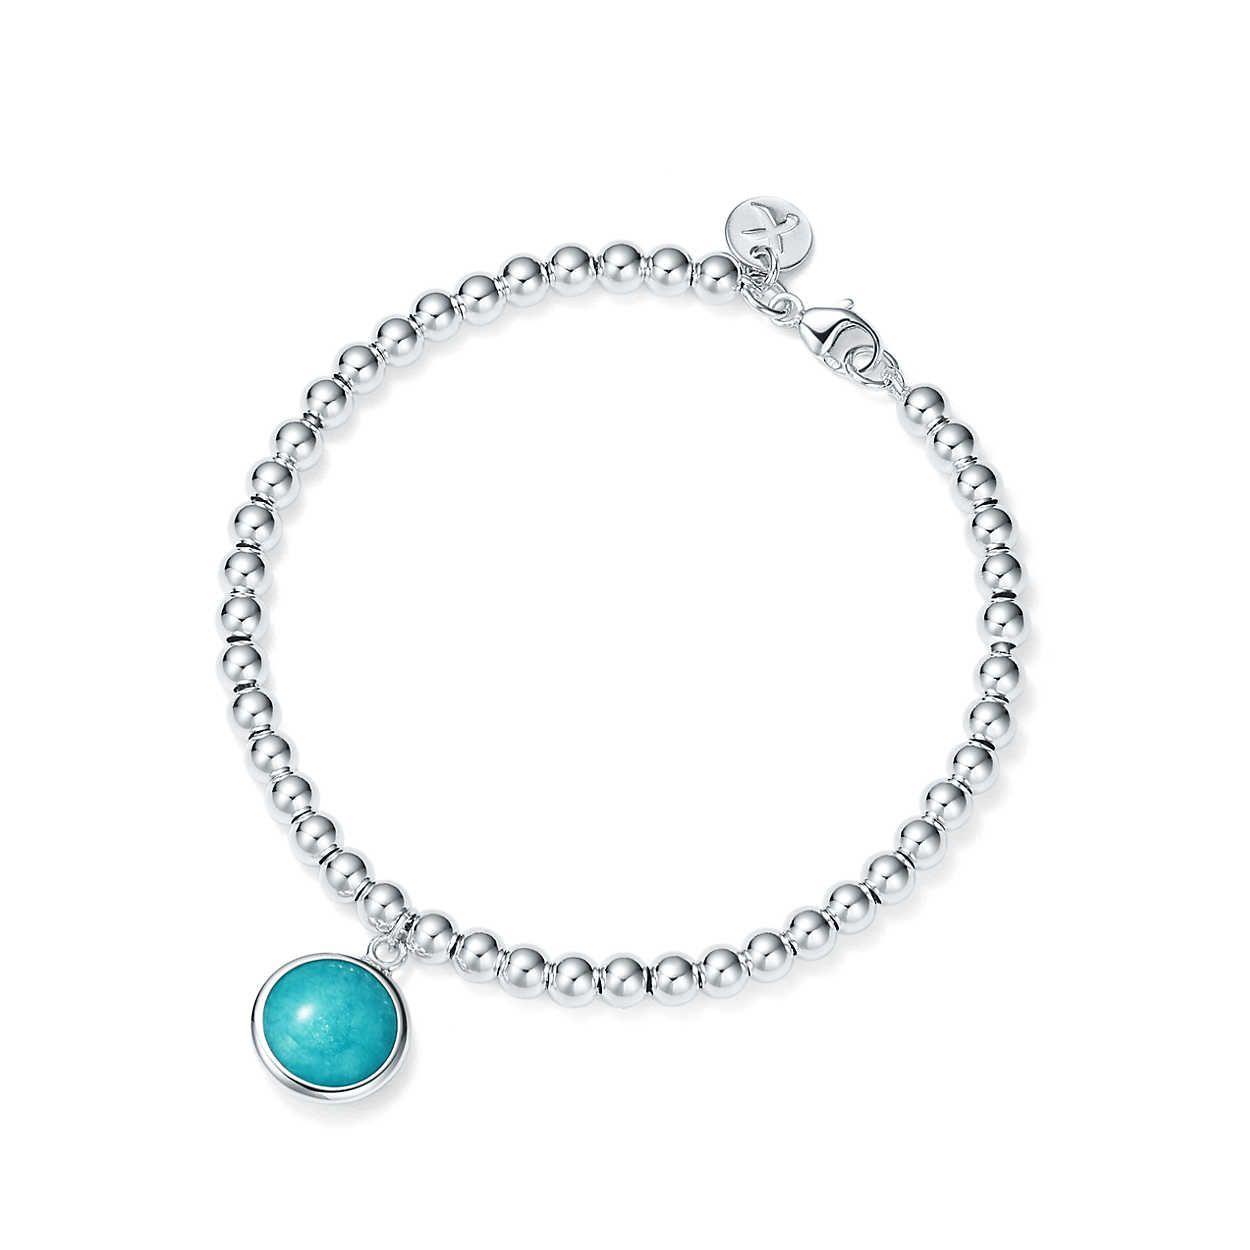 57d3381e7 Paloma's Sugar Stacks:Bracelet. Paloma's Sugar Stacks:Bracelet Tiffany ...